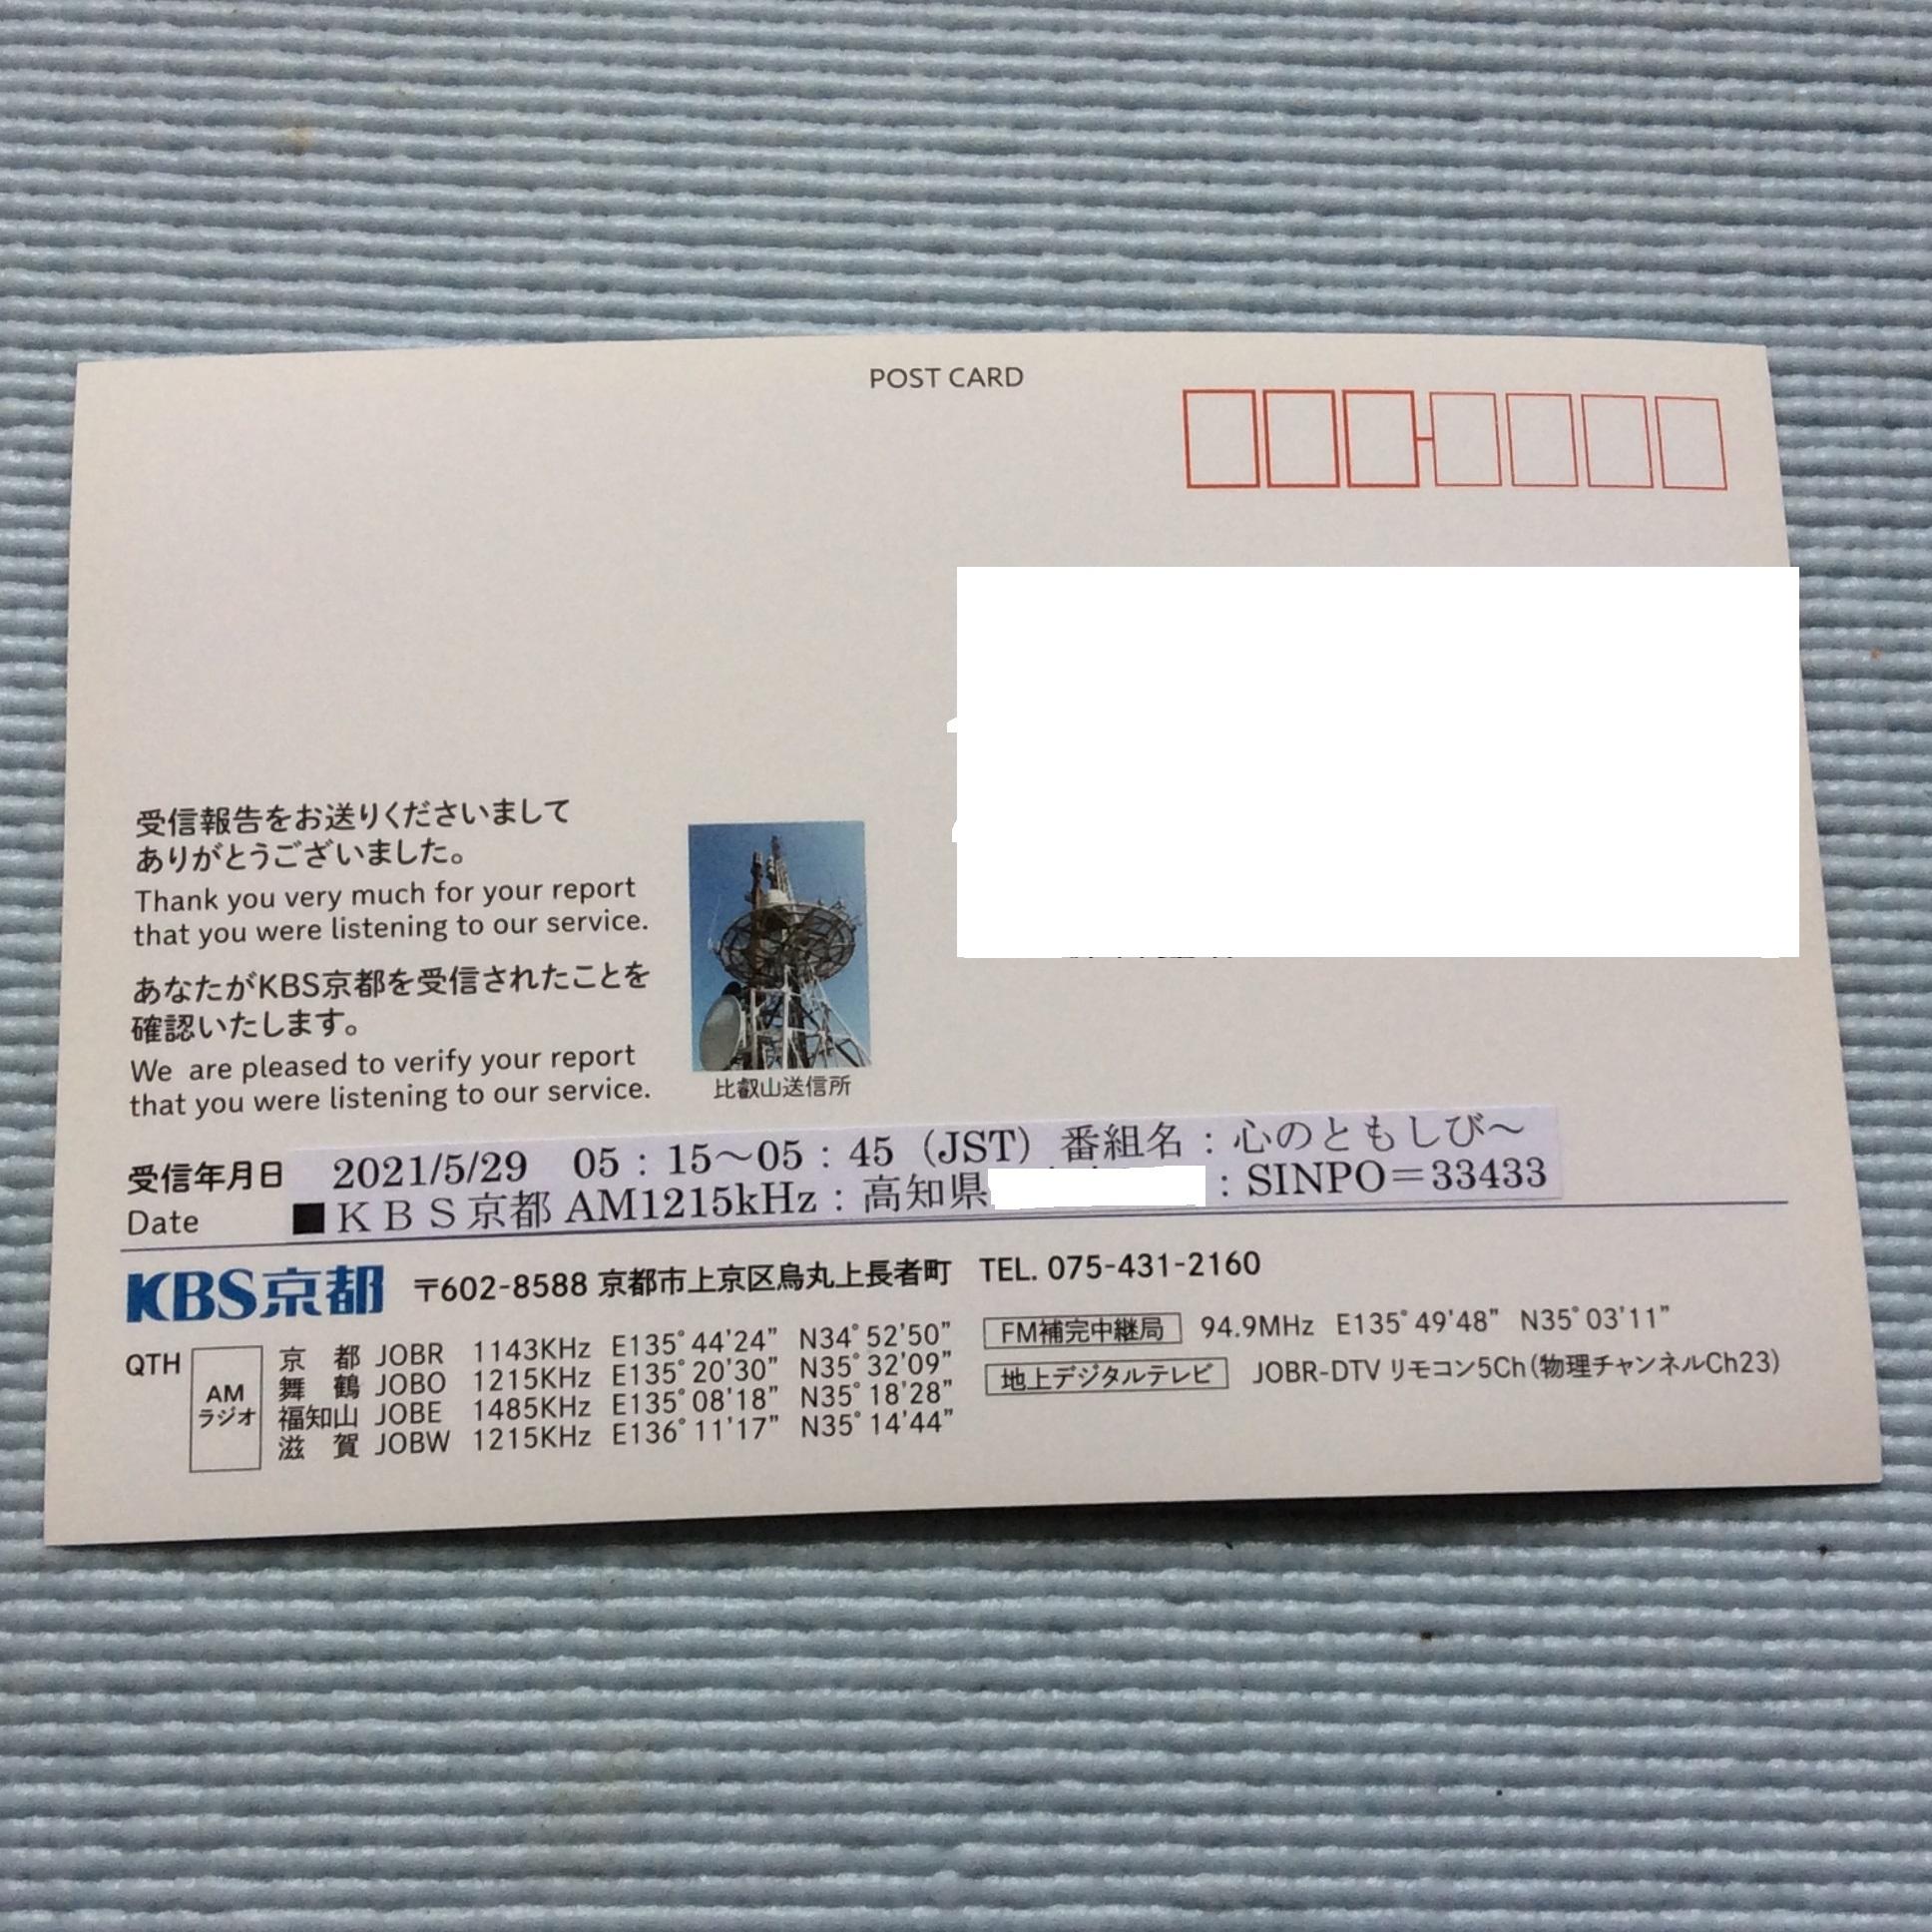 KBS kyoto 02